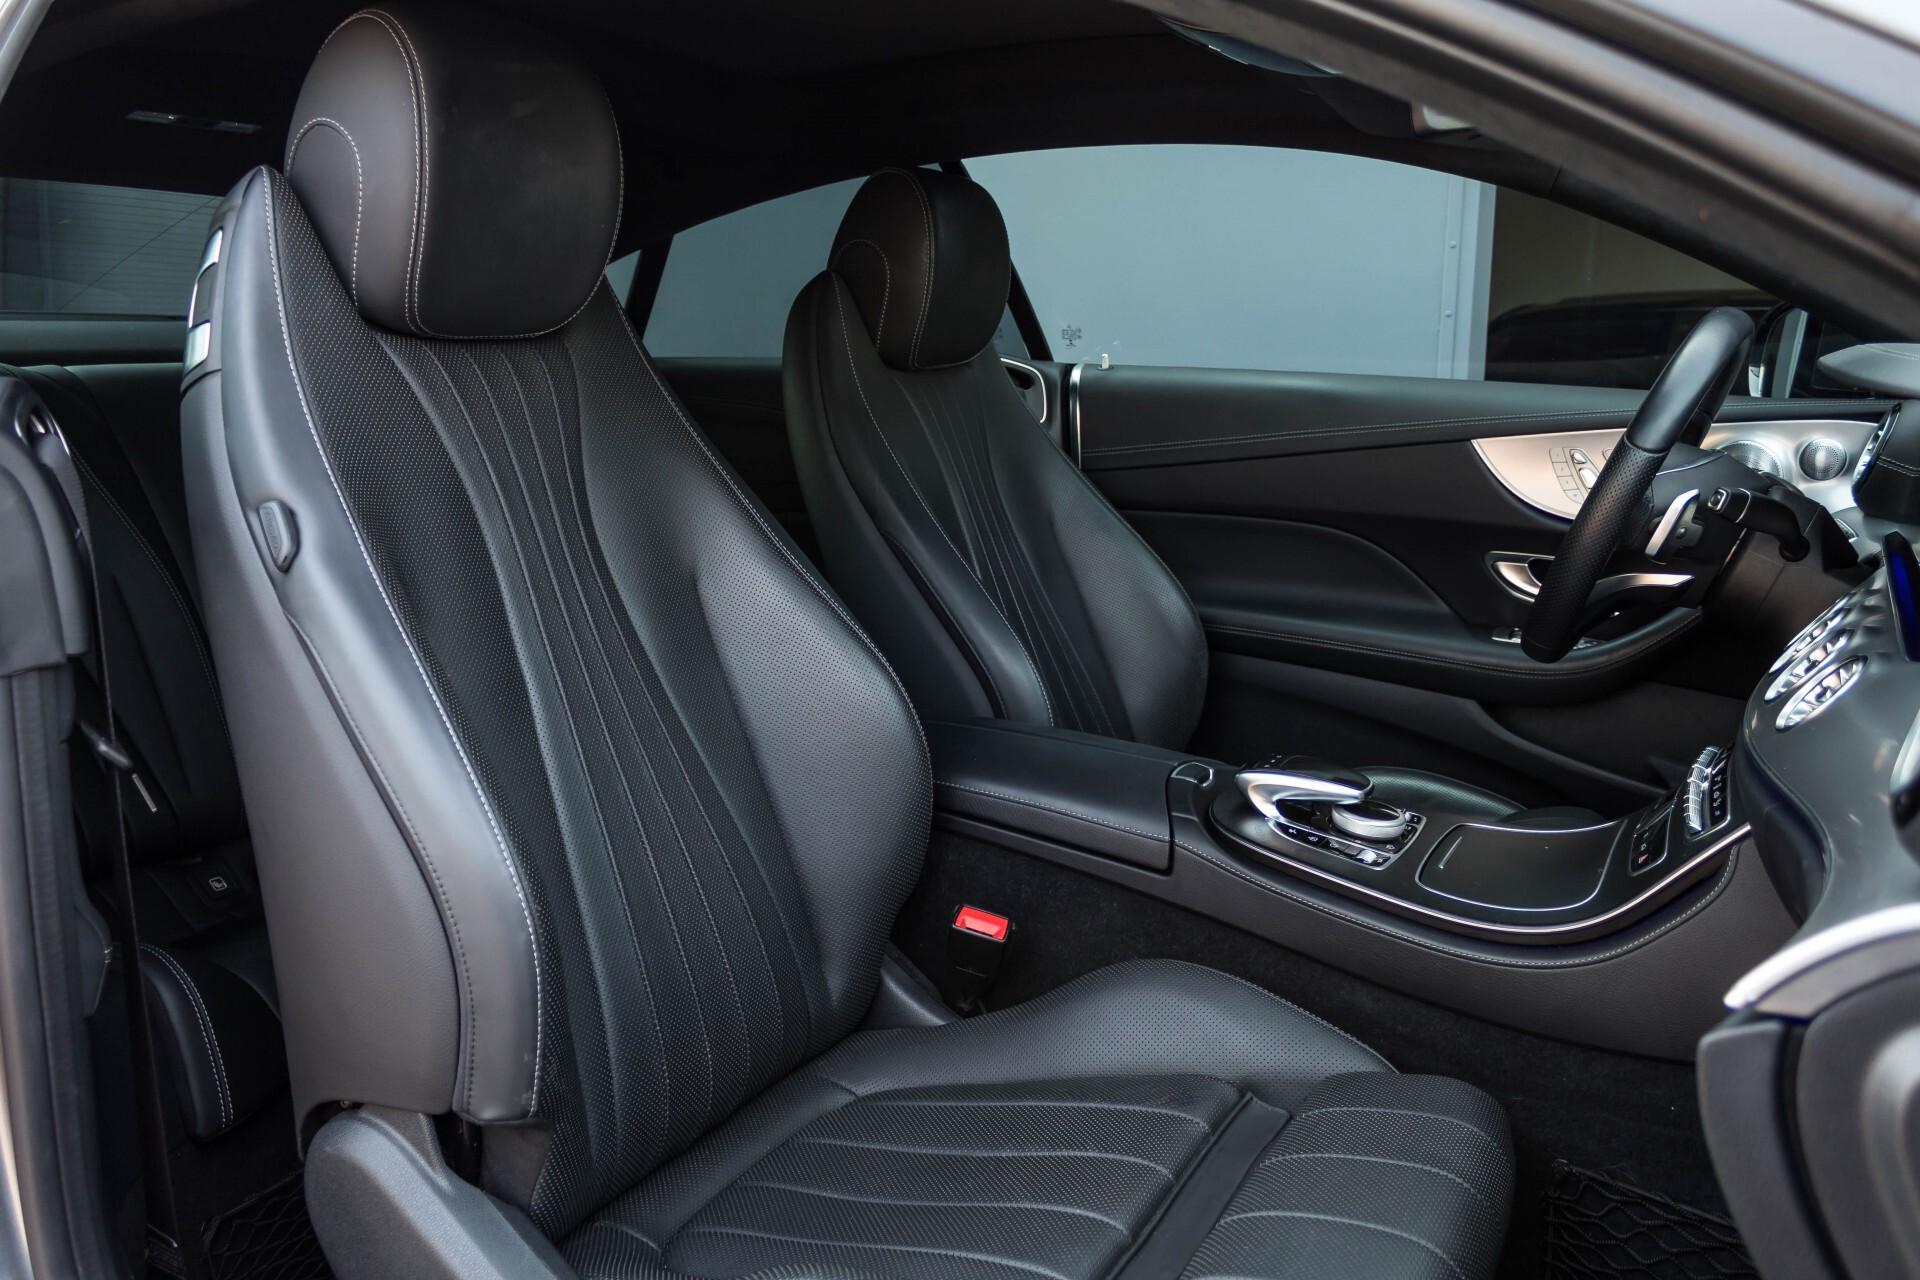 Mercedes-Benz E-Klasse Coupé 300 AMG Luchtvering/Distronic/Keyless/Designo/Burmester/Stoelkoeling Aut7 Foto 3